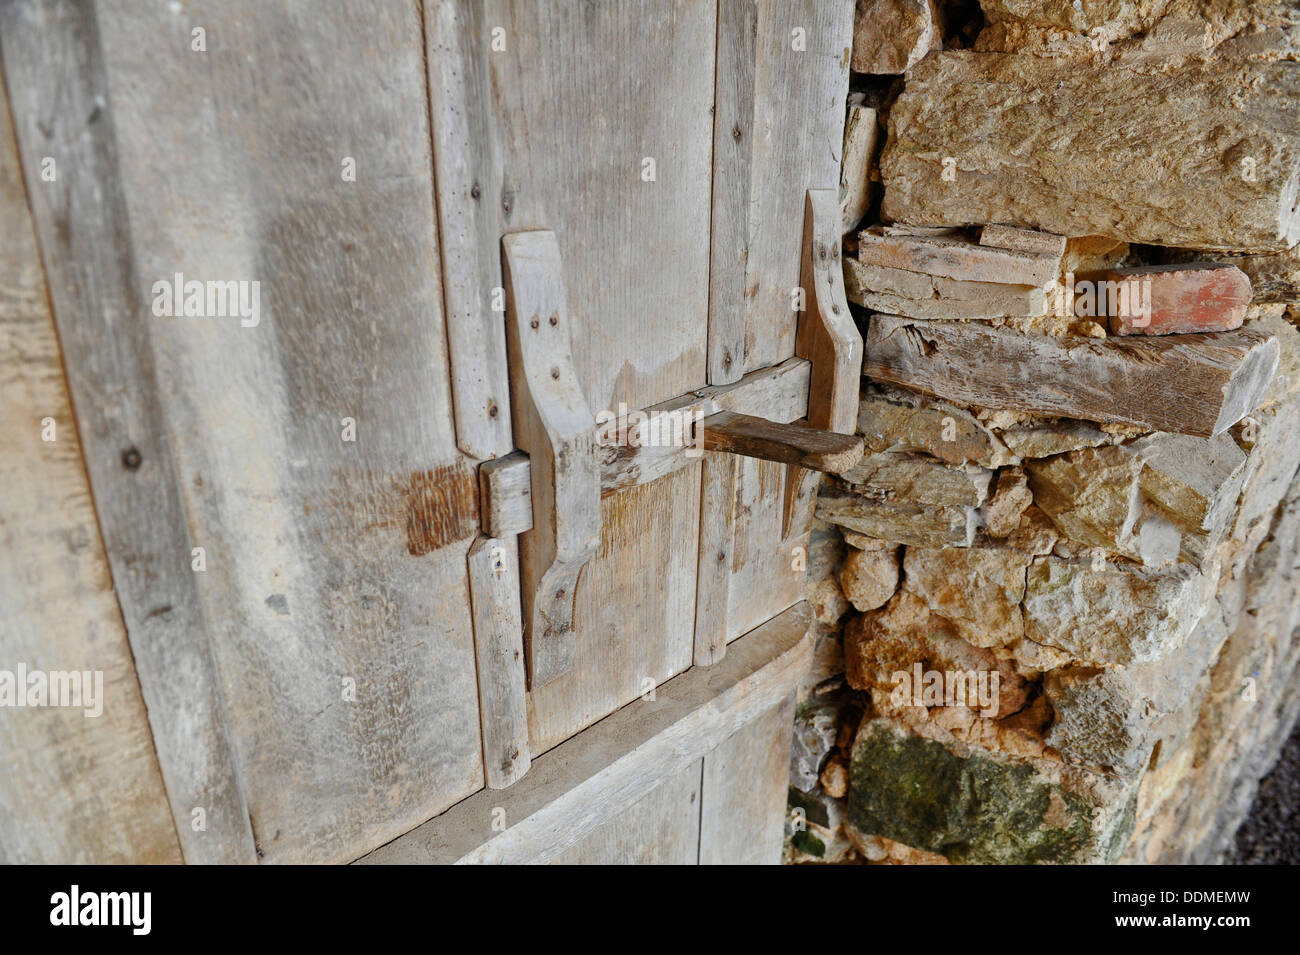 Barn door latches - Old Wooden Barn Door Latch And Inner Stone Wall